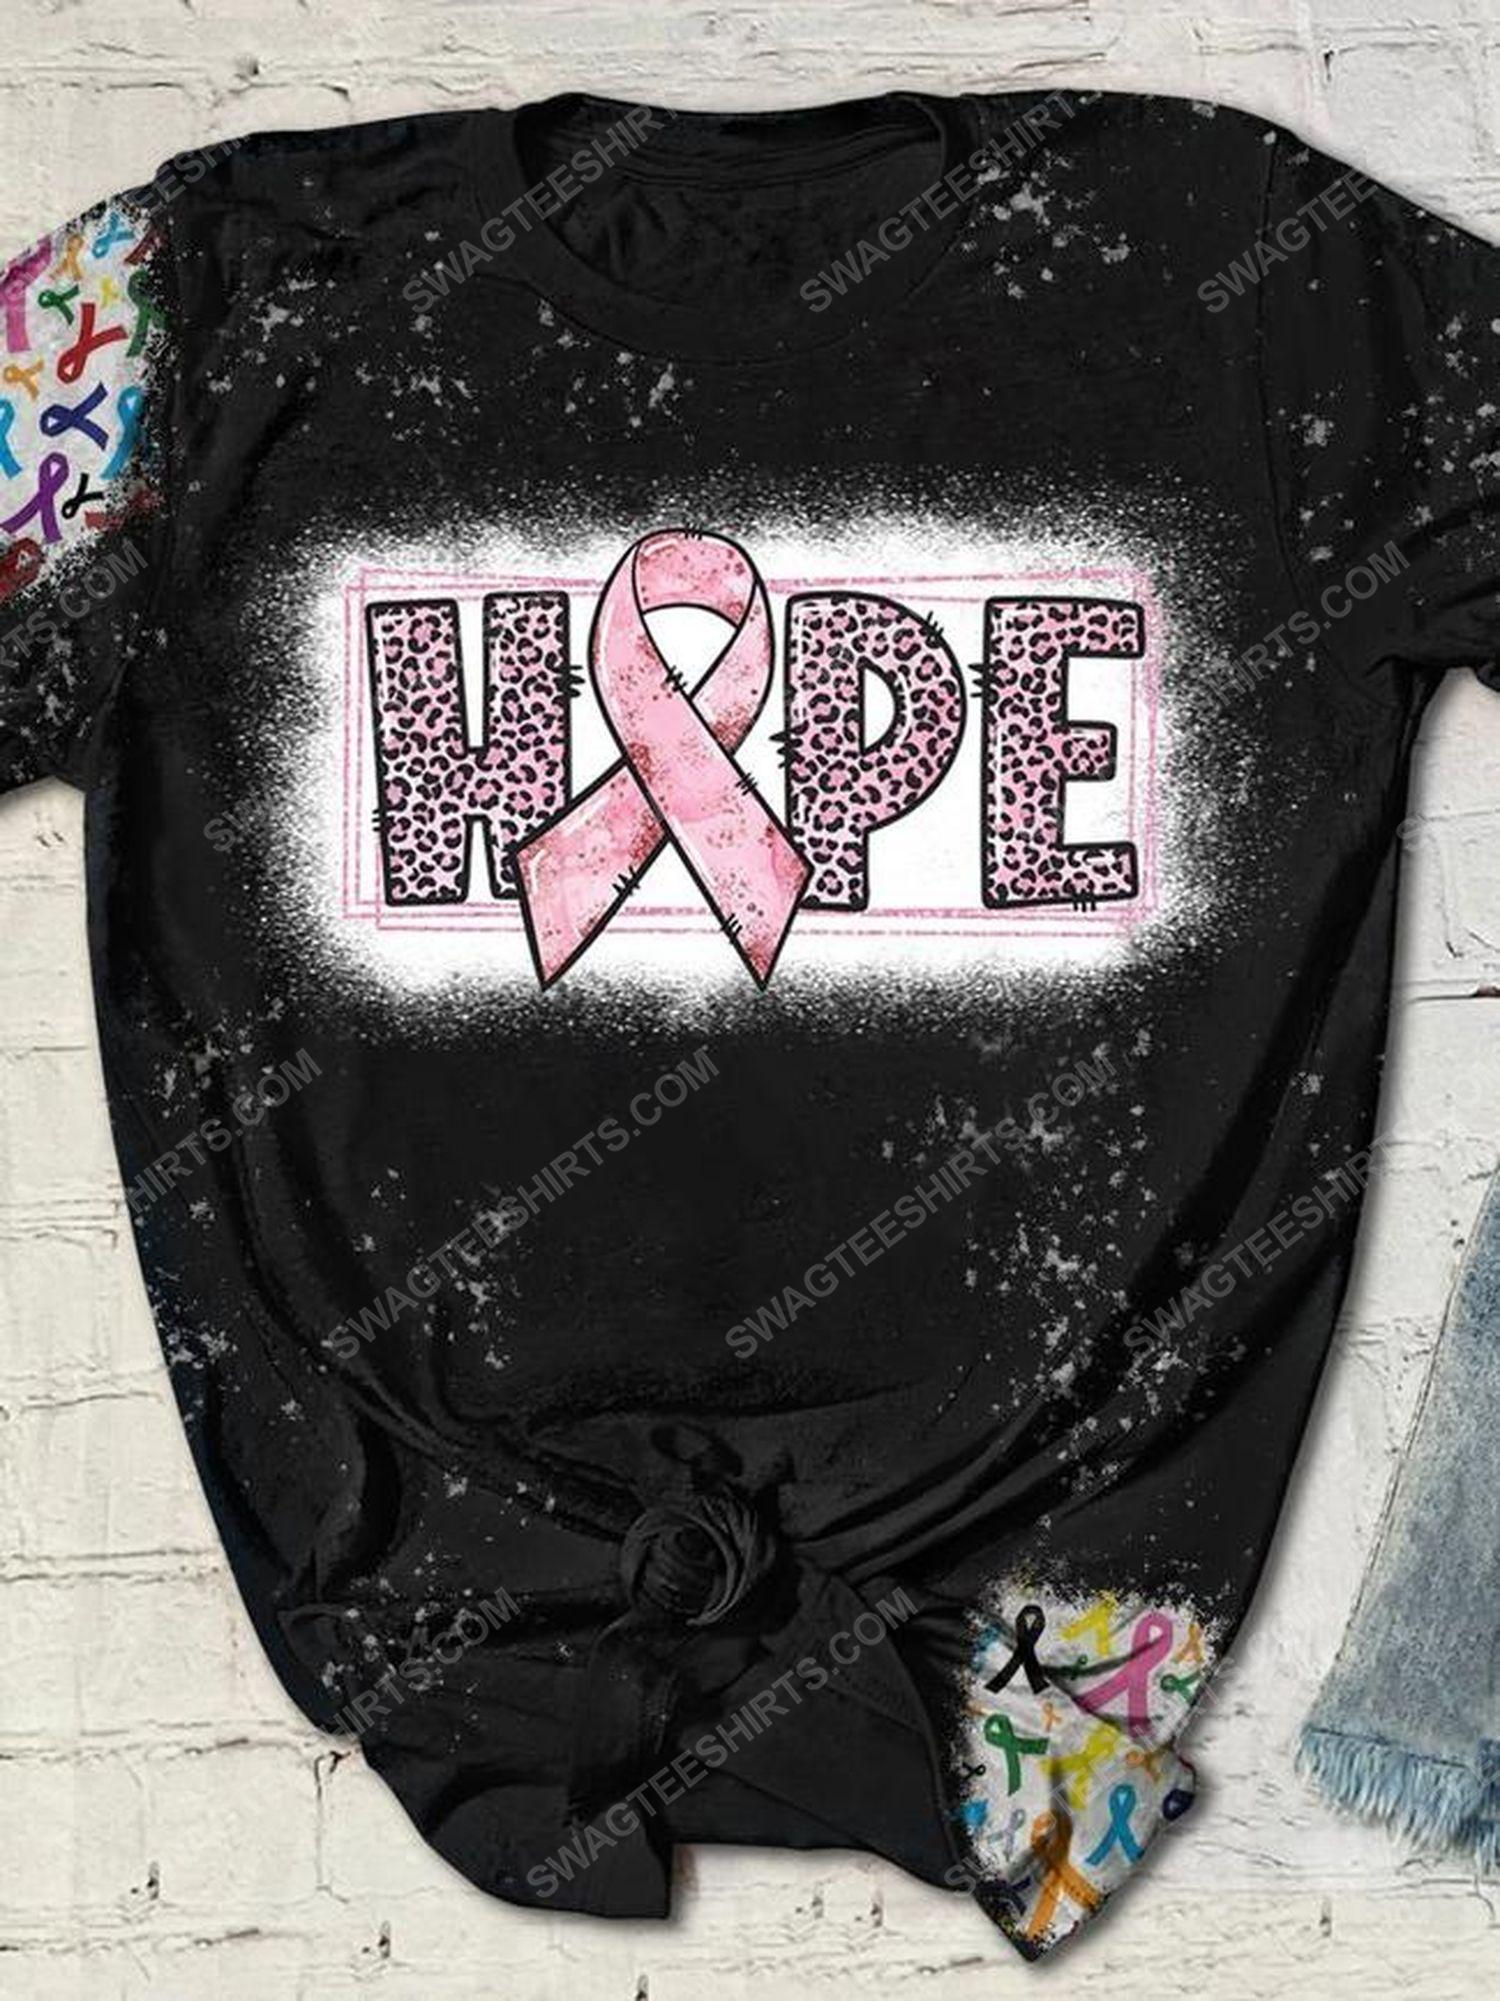 Breast cancer awareness hope full print shirt